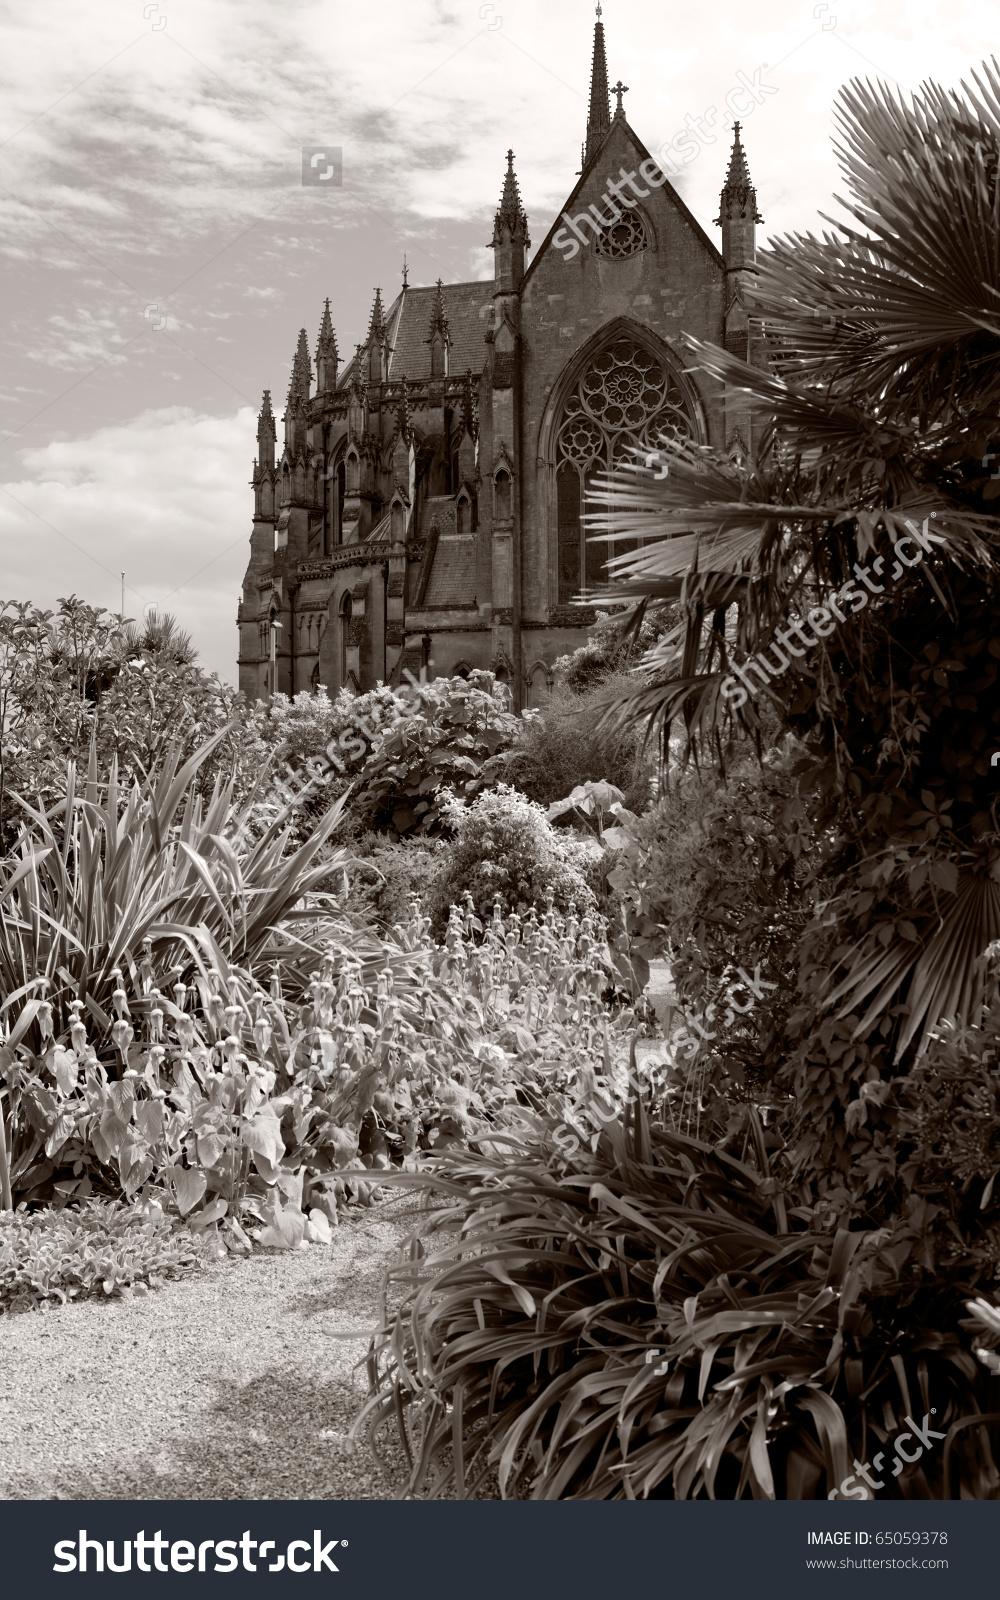 Arundel Cathedral And Arundel Castle Garden. Church In Gothic.